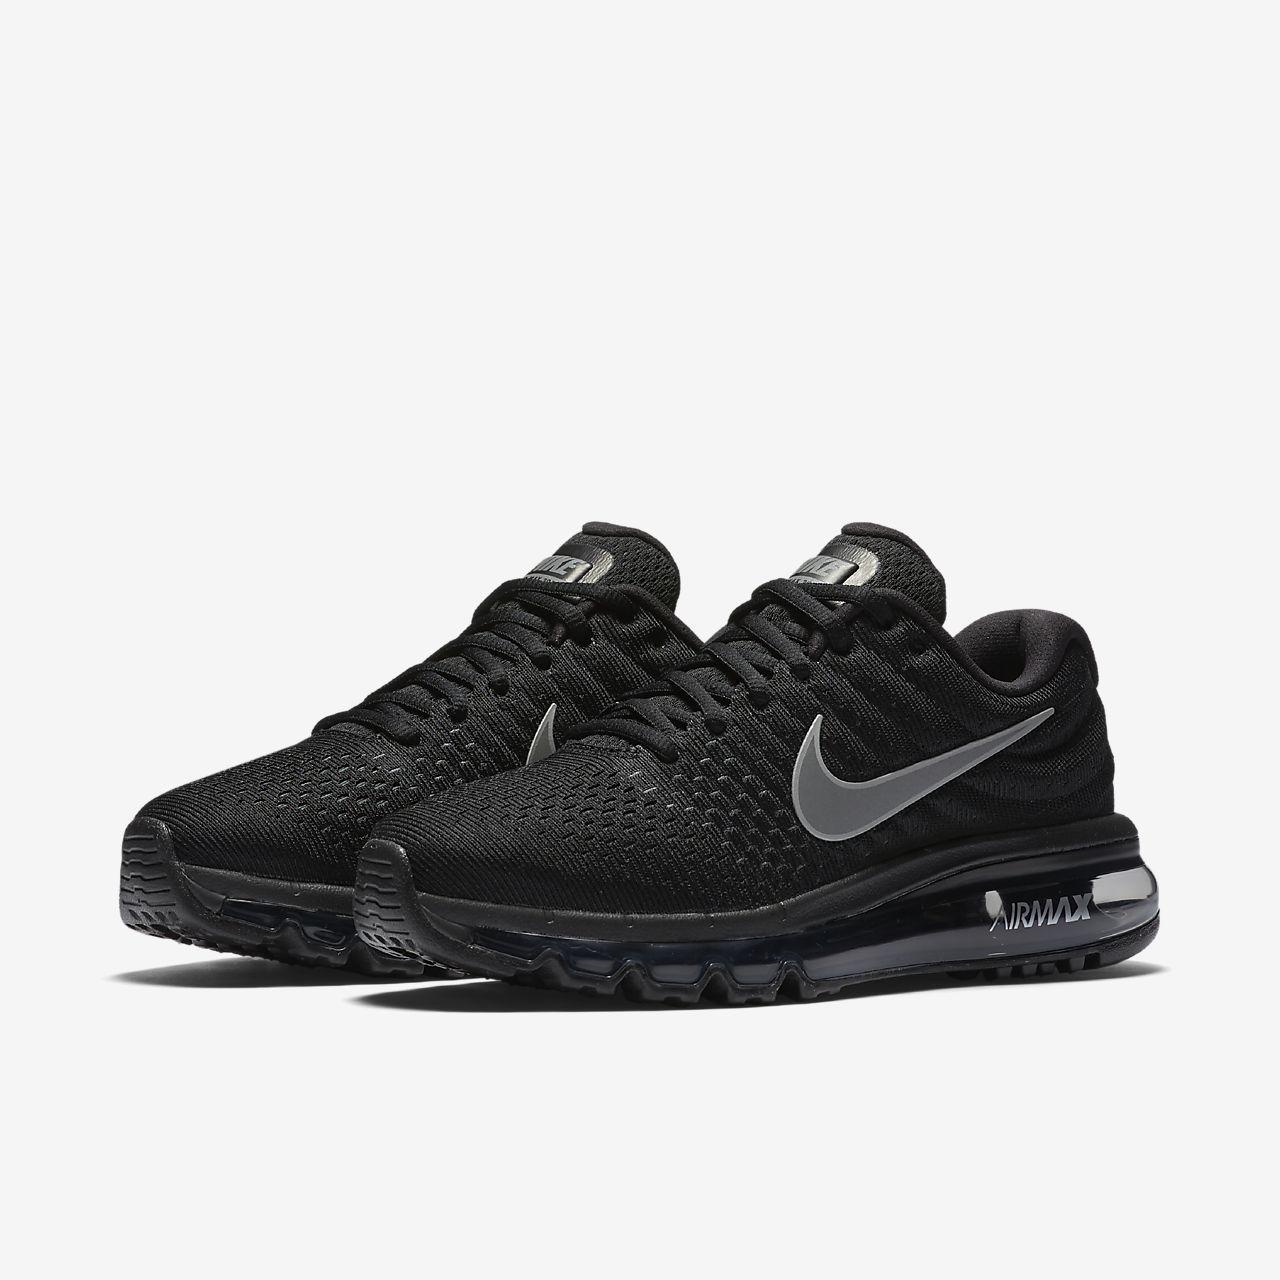 online retailer b79a5 b63e3 Nike Air Max 2017 Women s Running Shoe